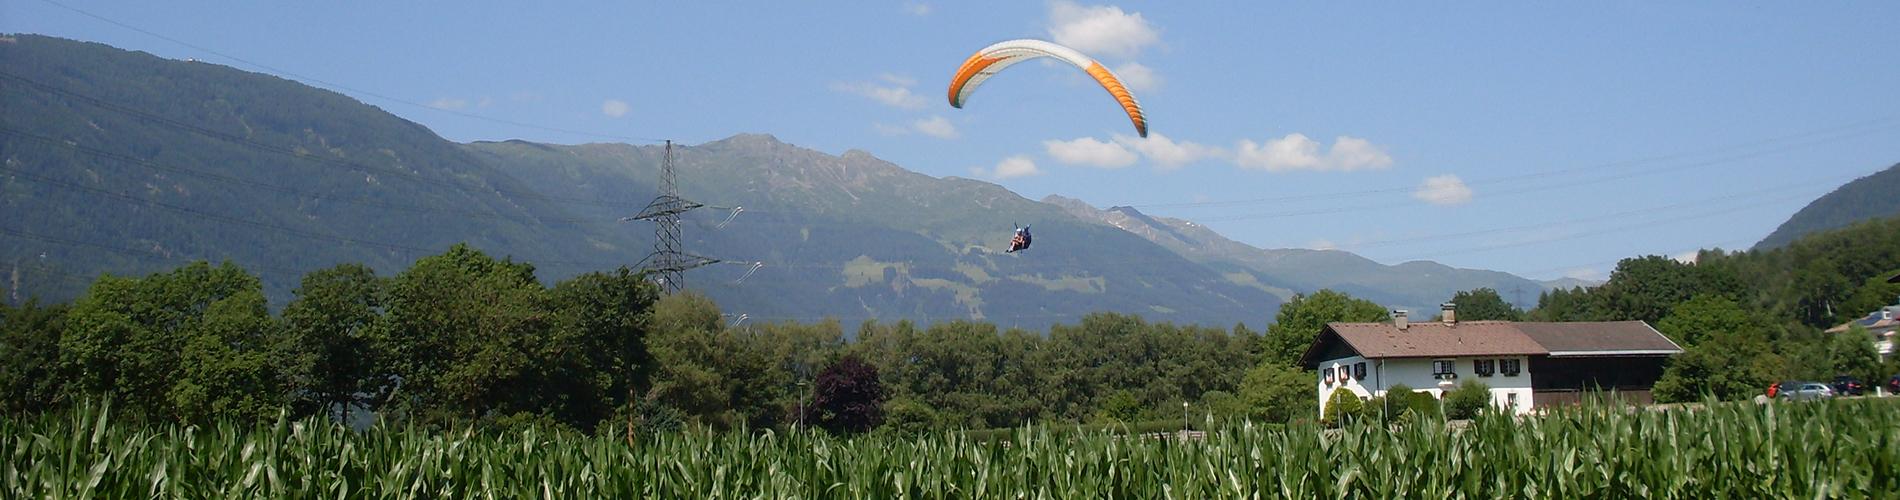 slider-1900x500_tandem-paragliding-austria_008